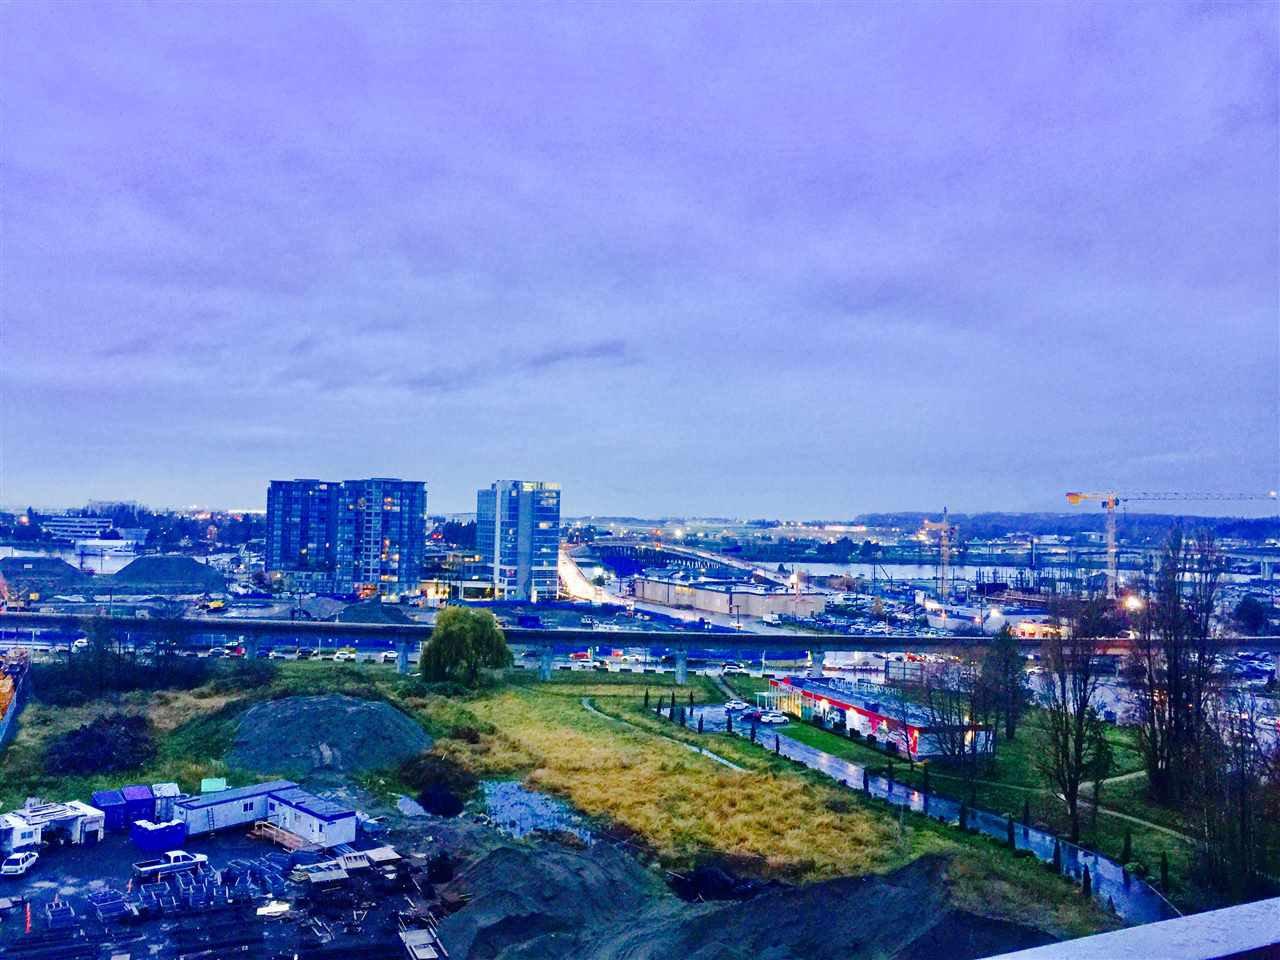 Main Photo: 1006 8833 HAZELBRIDGE WAY in Richmond: West Cambie Condo for sale : MLS®# R2124473